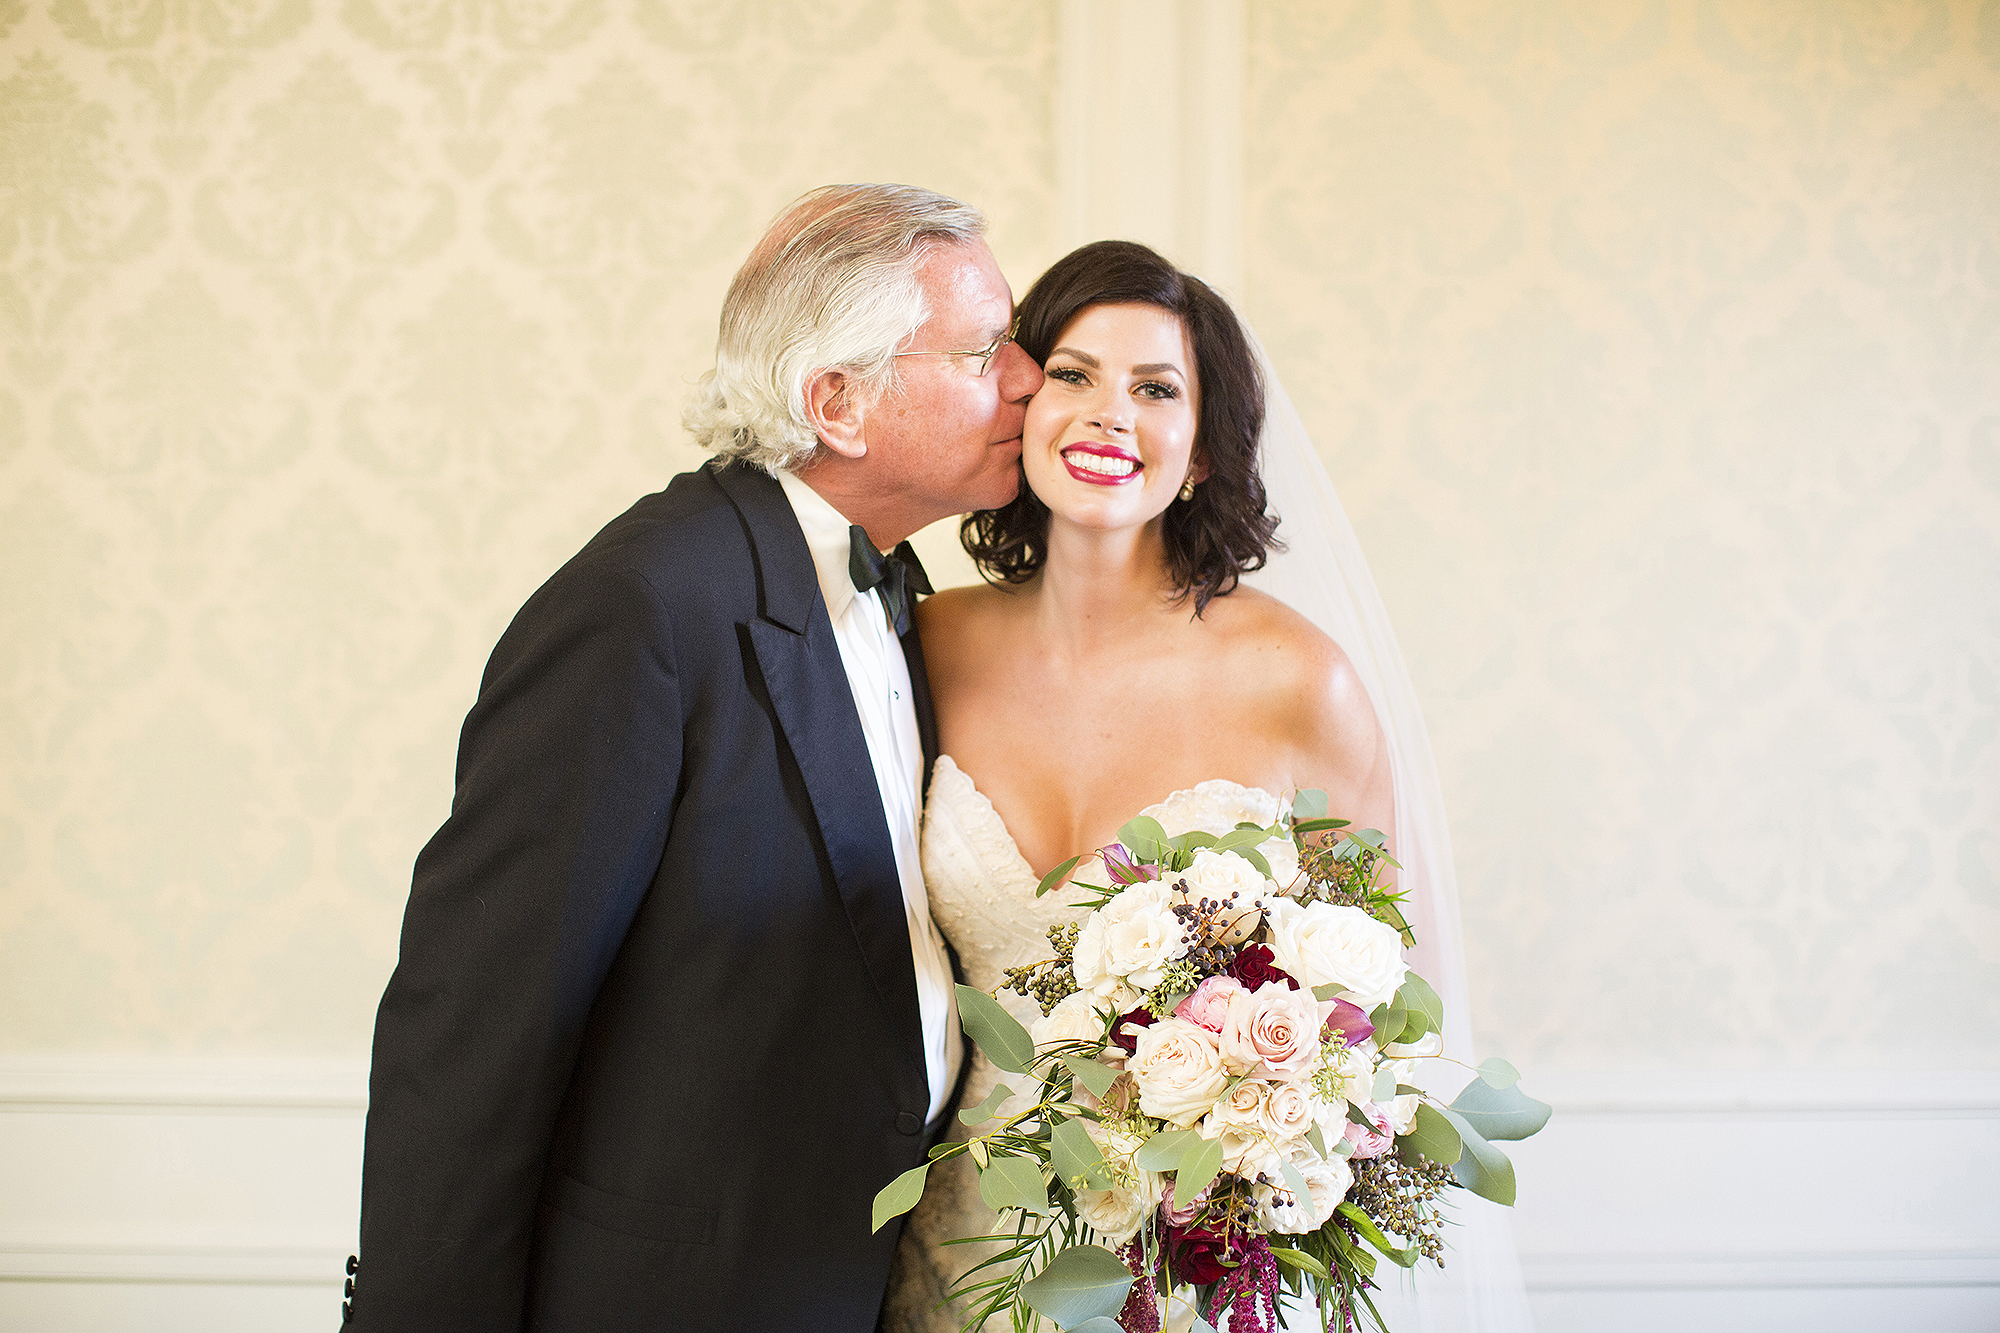 Seriously_Sabrina_Photography_Lexington_Kentucky_Wedding_Photographer_Boone865.jpg